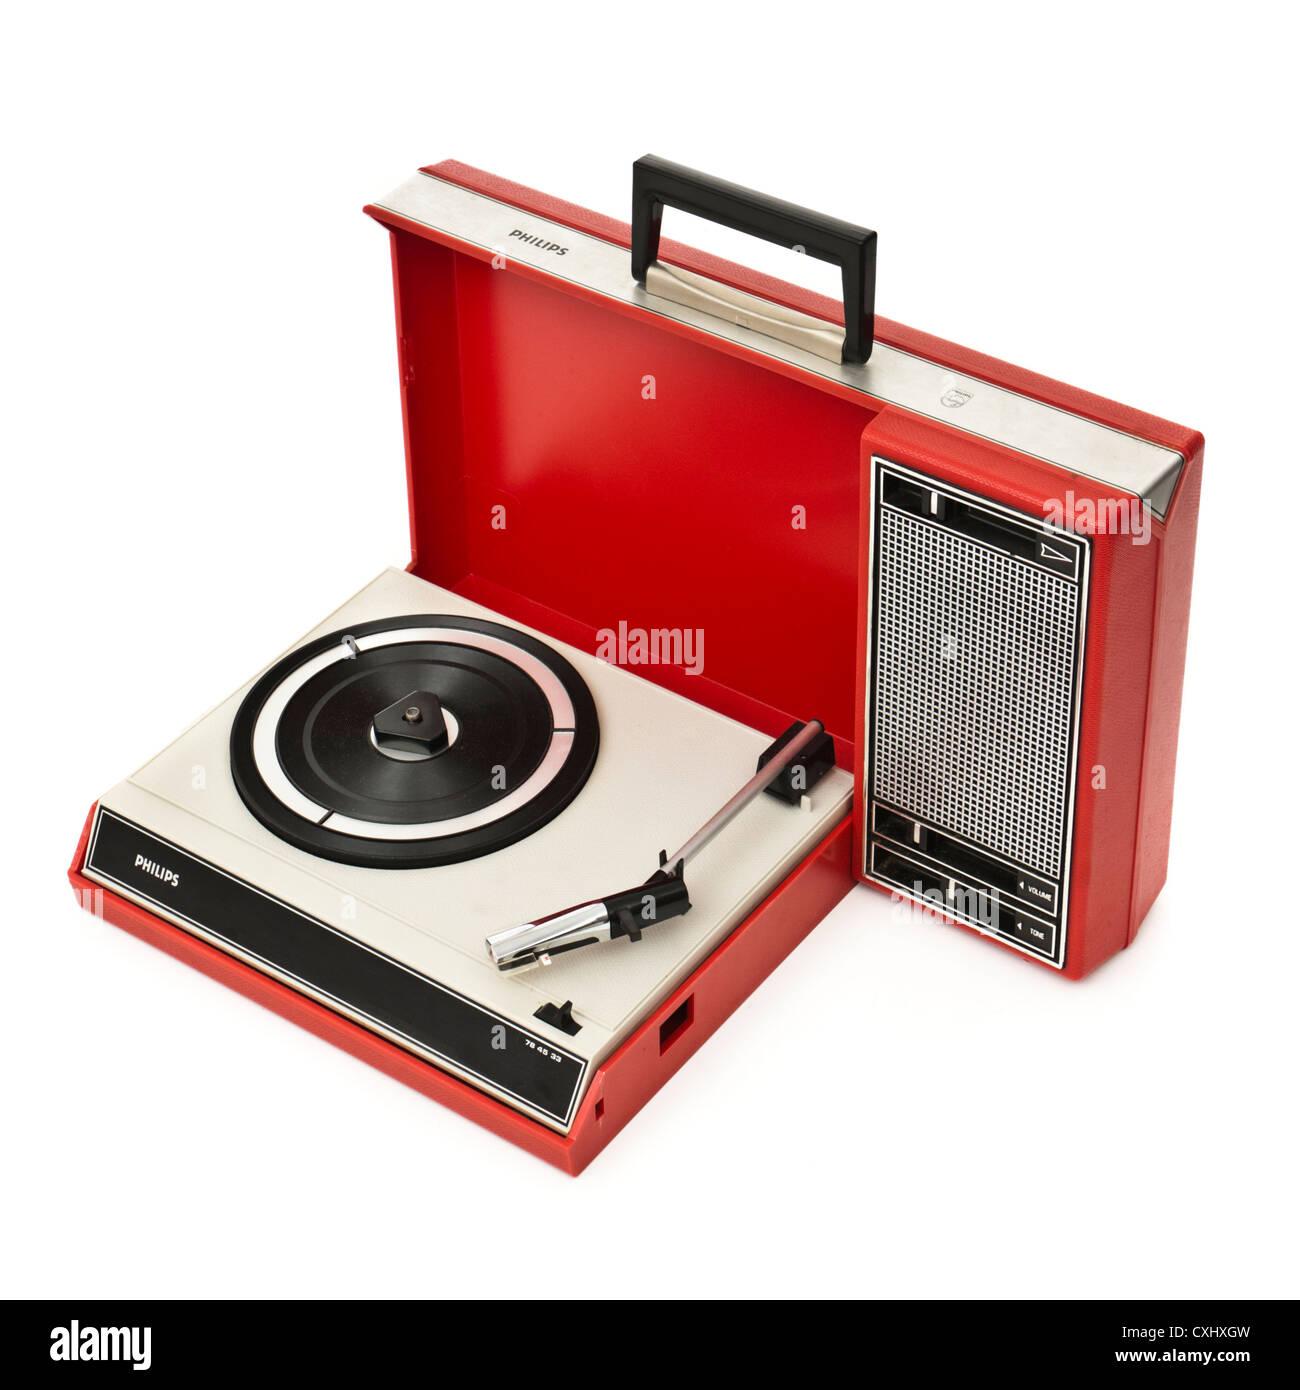 https://c8.alamy.com/comp/CXHXGW/rare-vintage-1972-philips-gf403-party-de-luxe-folding-3-speed-red-CXHXGW.jpg